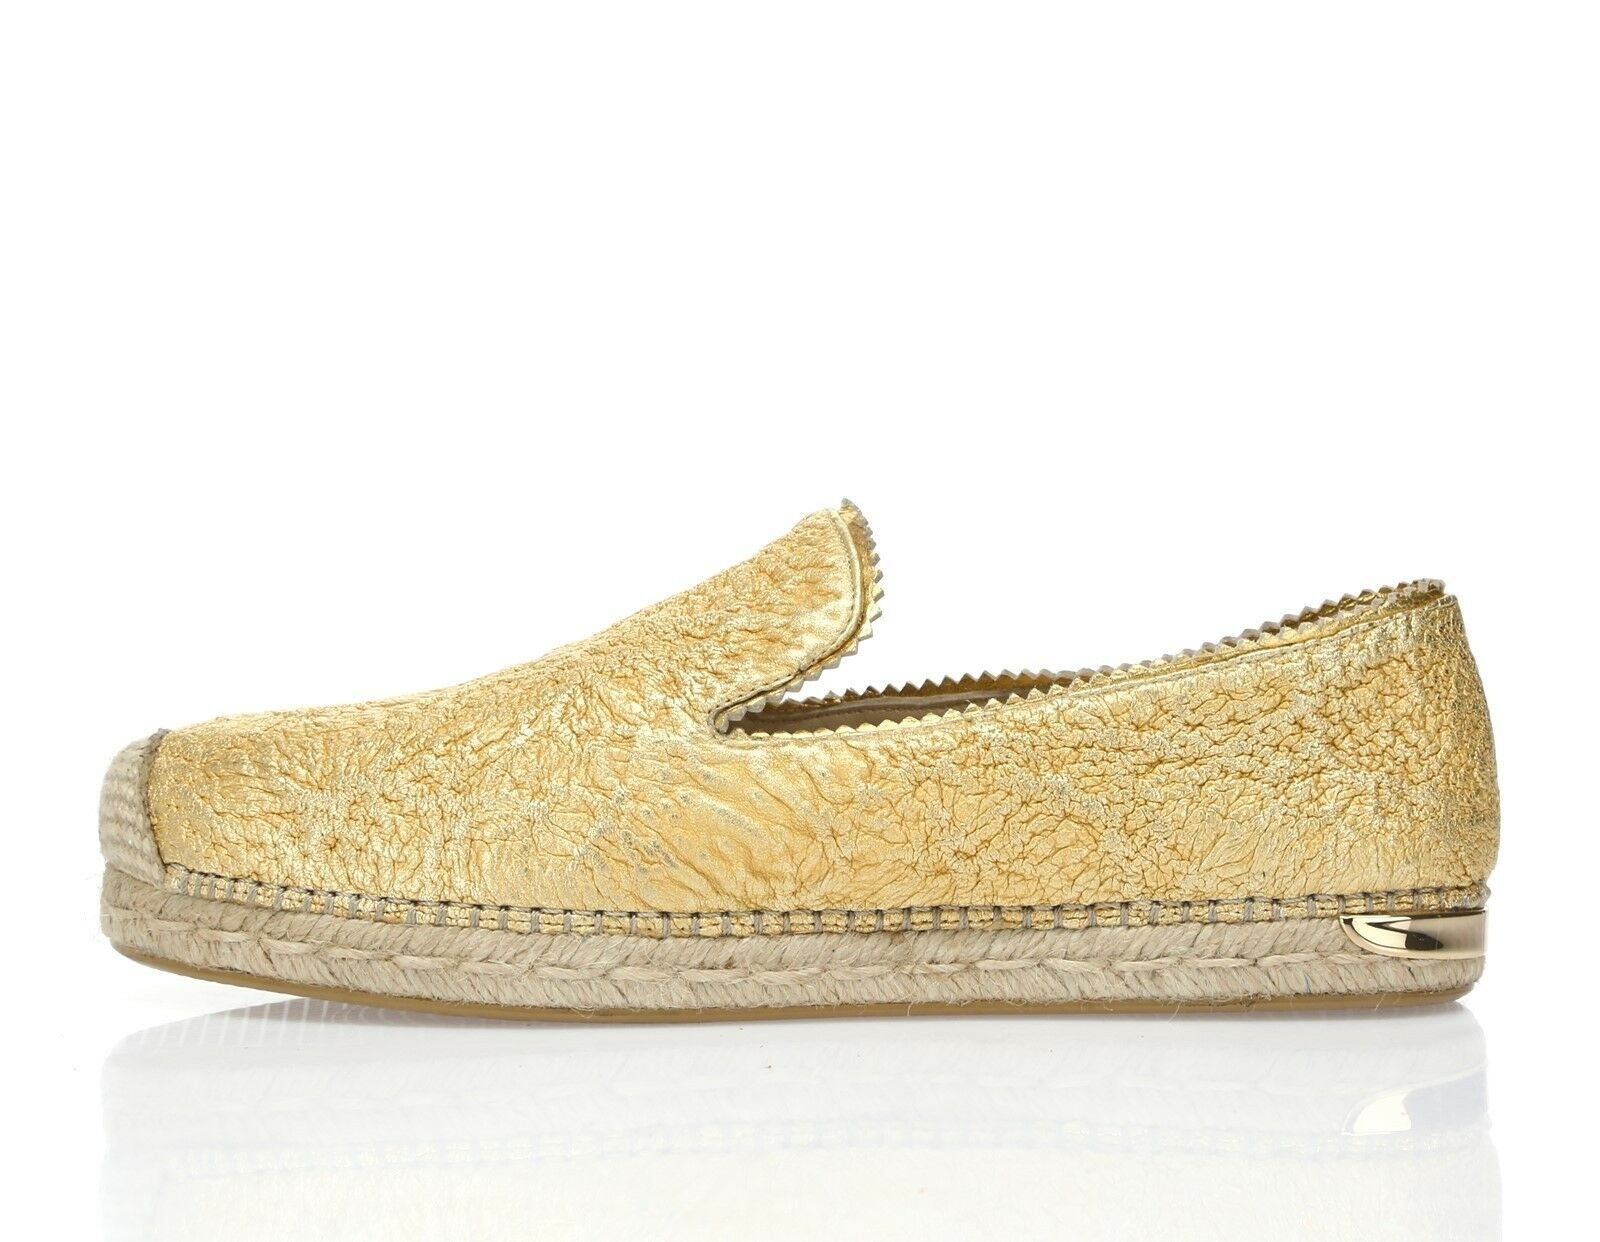 Donna Stuart Weitzman Biarritz gold pelle espadrilles sz. 10 M